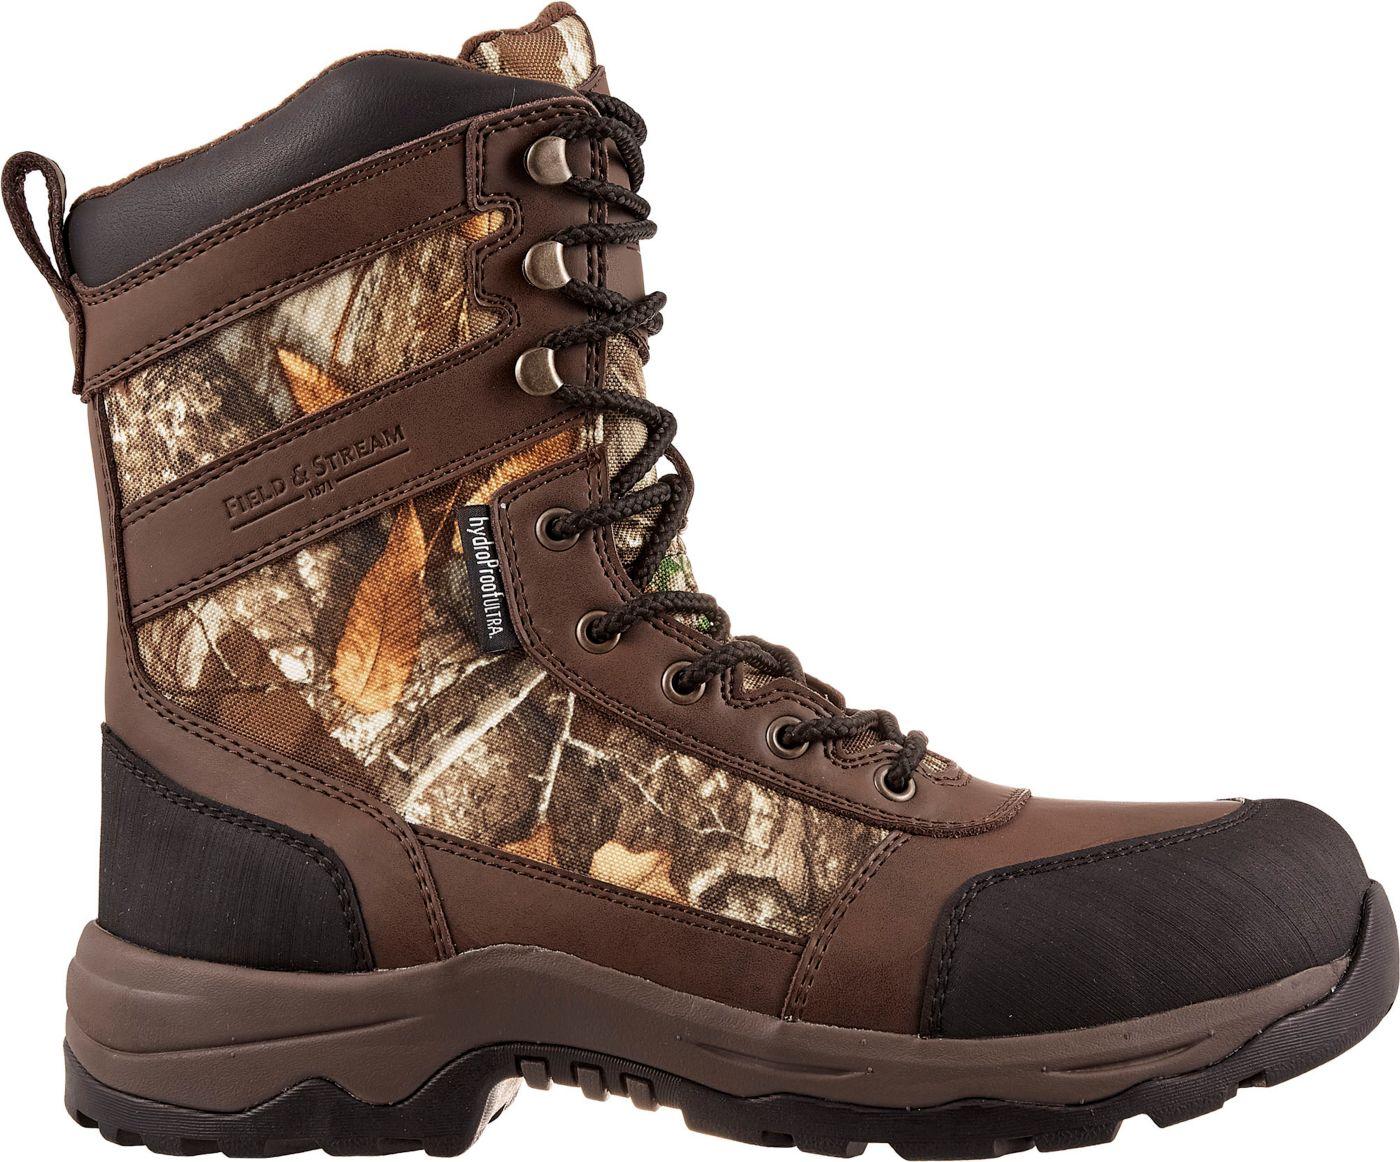 Field & Stream Men's Woodland Tracker 400g RTE Waterproof Hunting Boots